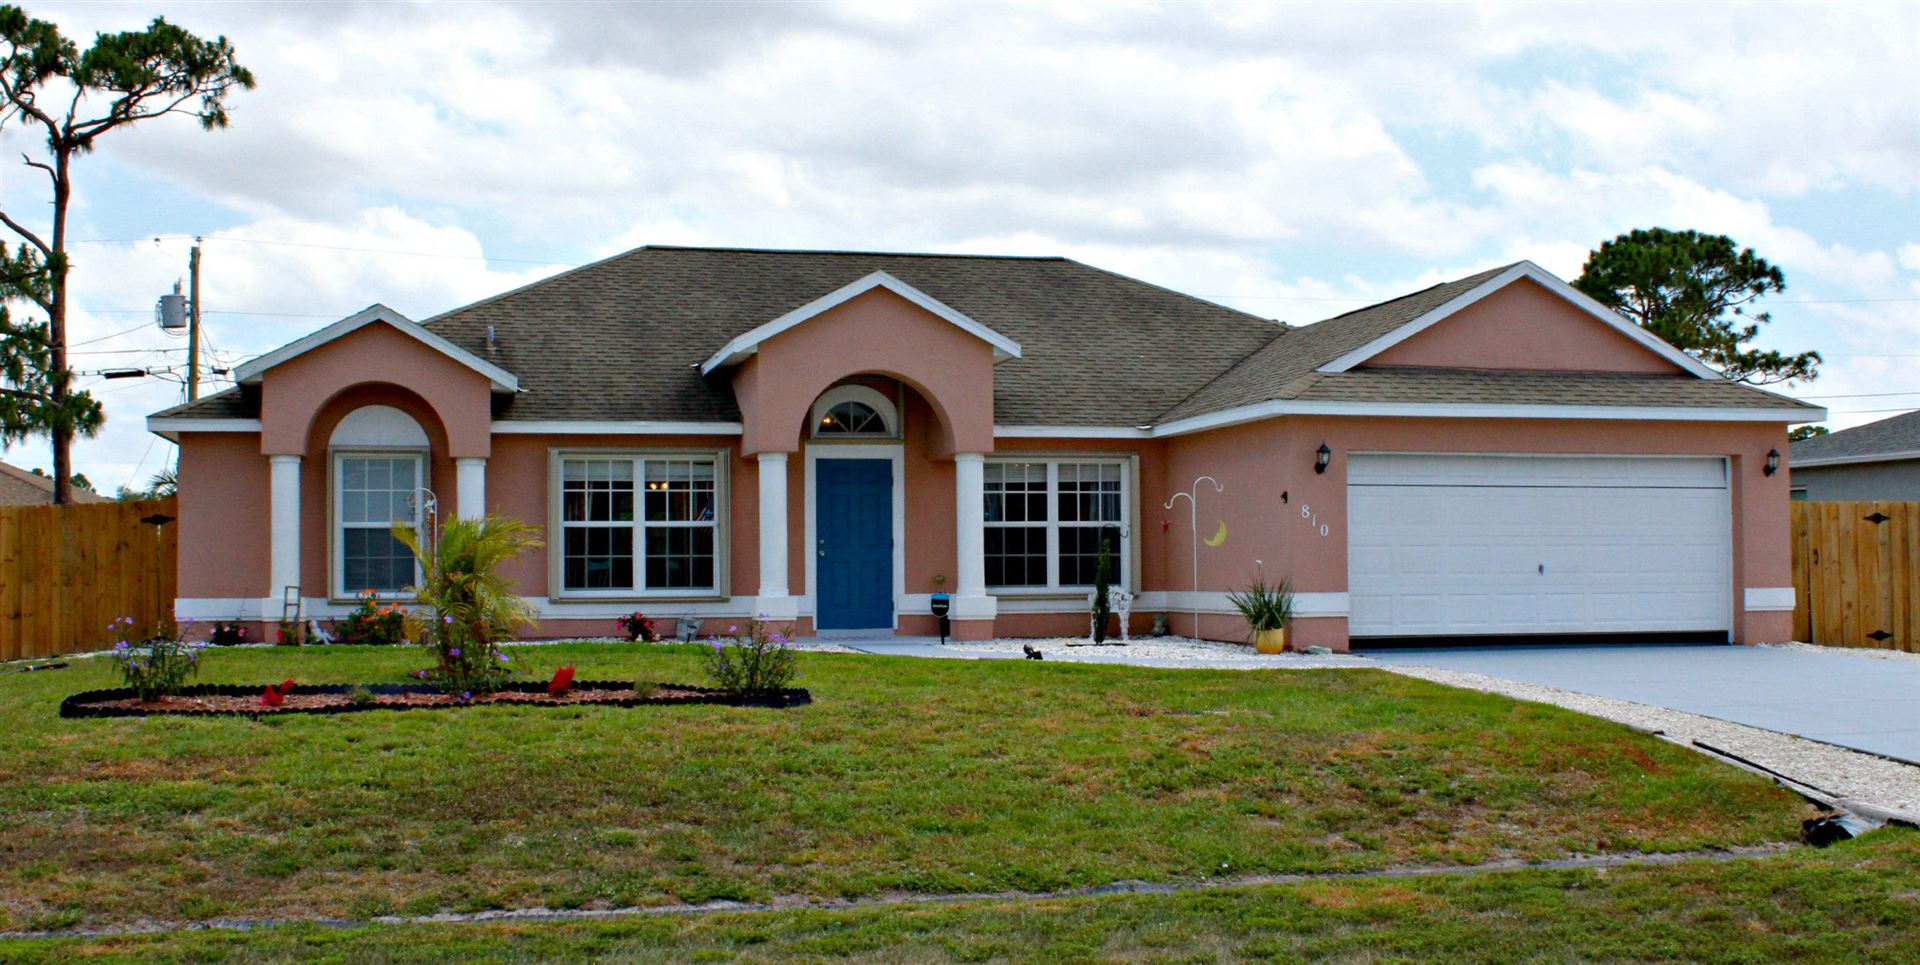 810 SW Nichols Terrace, Port Saint Lucie, FL 34953 - MLS#: RX-10714788